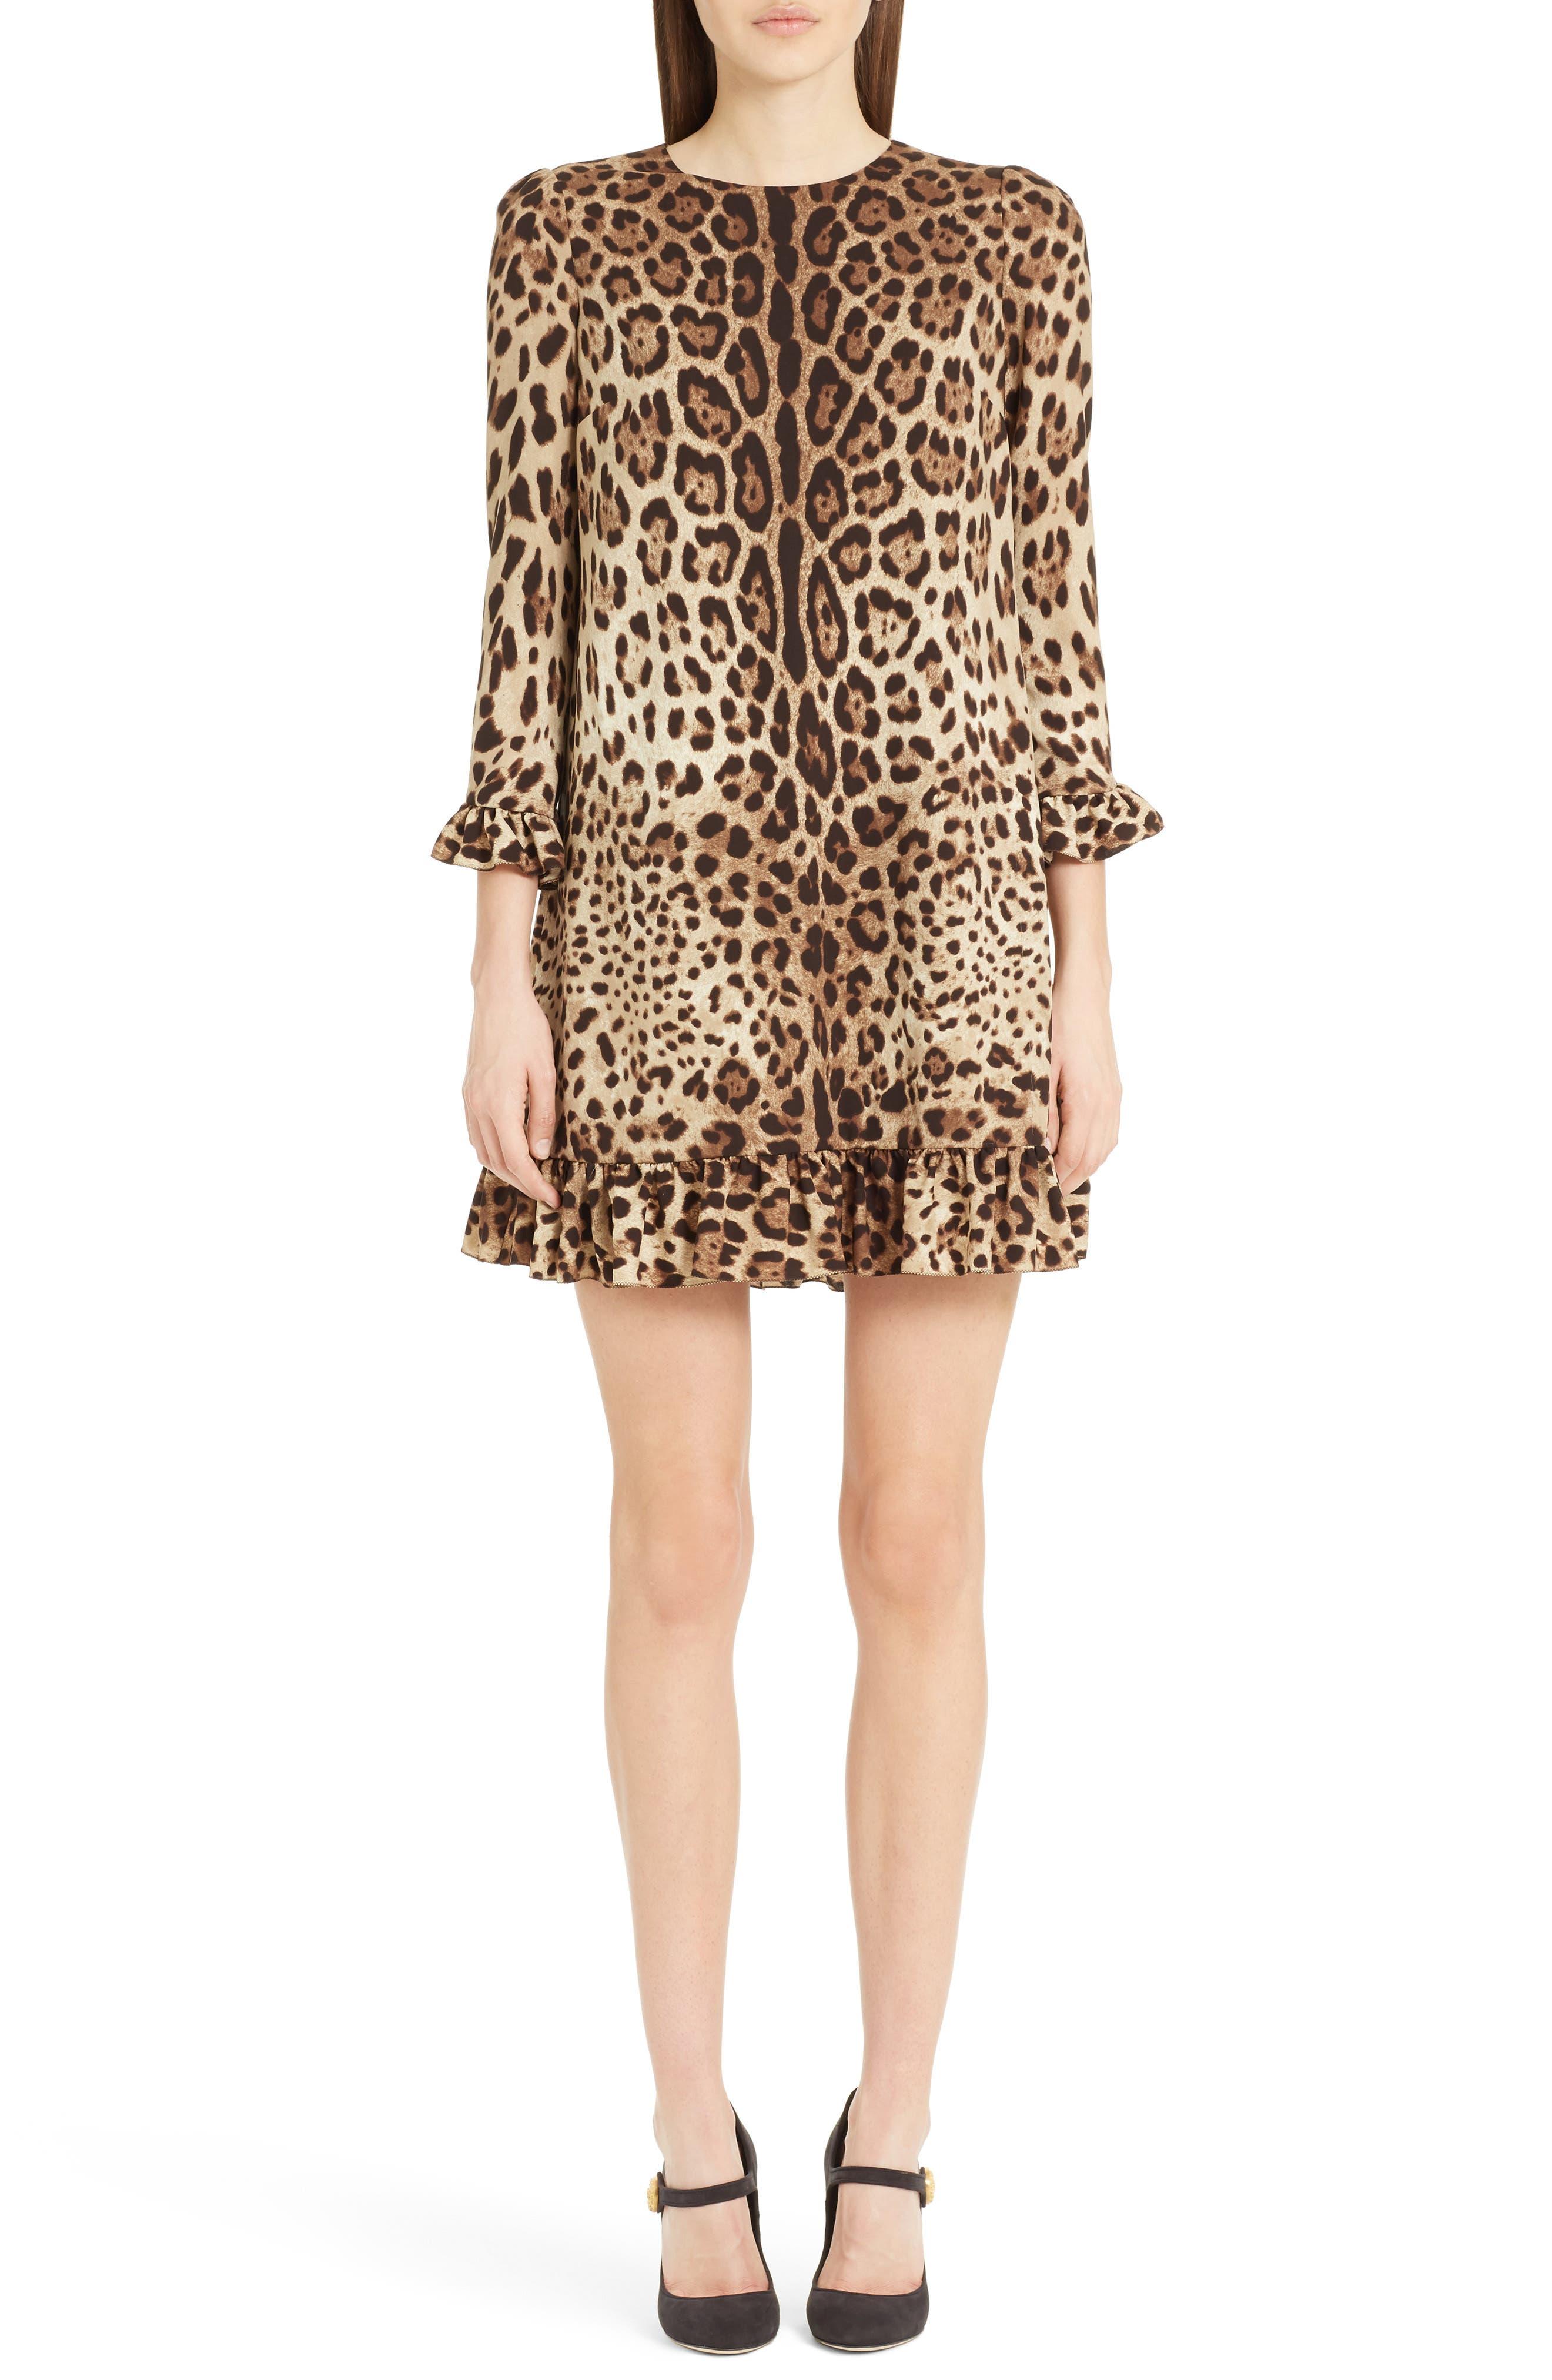 Dolce&Gabbana Leopard Print Stretch Silk Dress